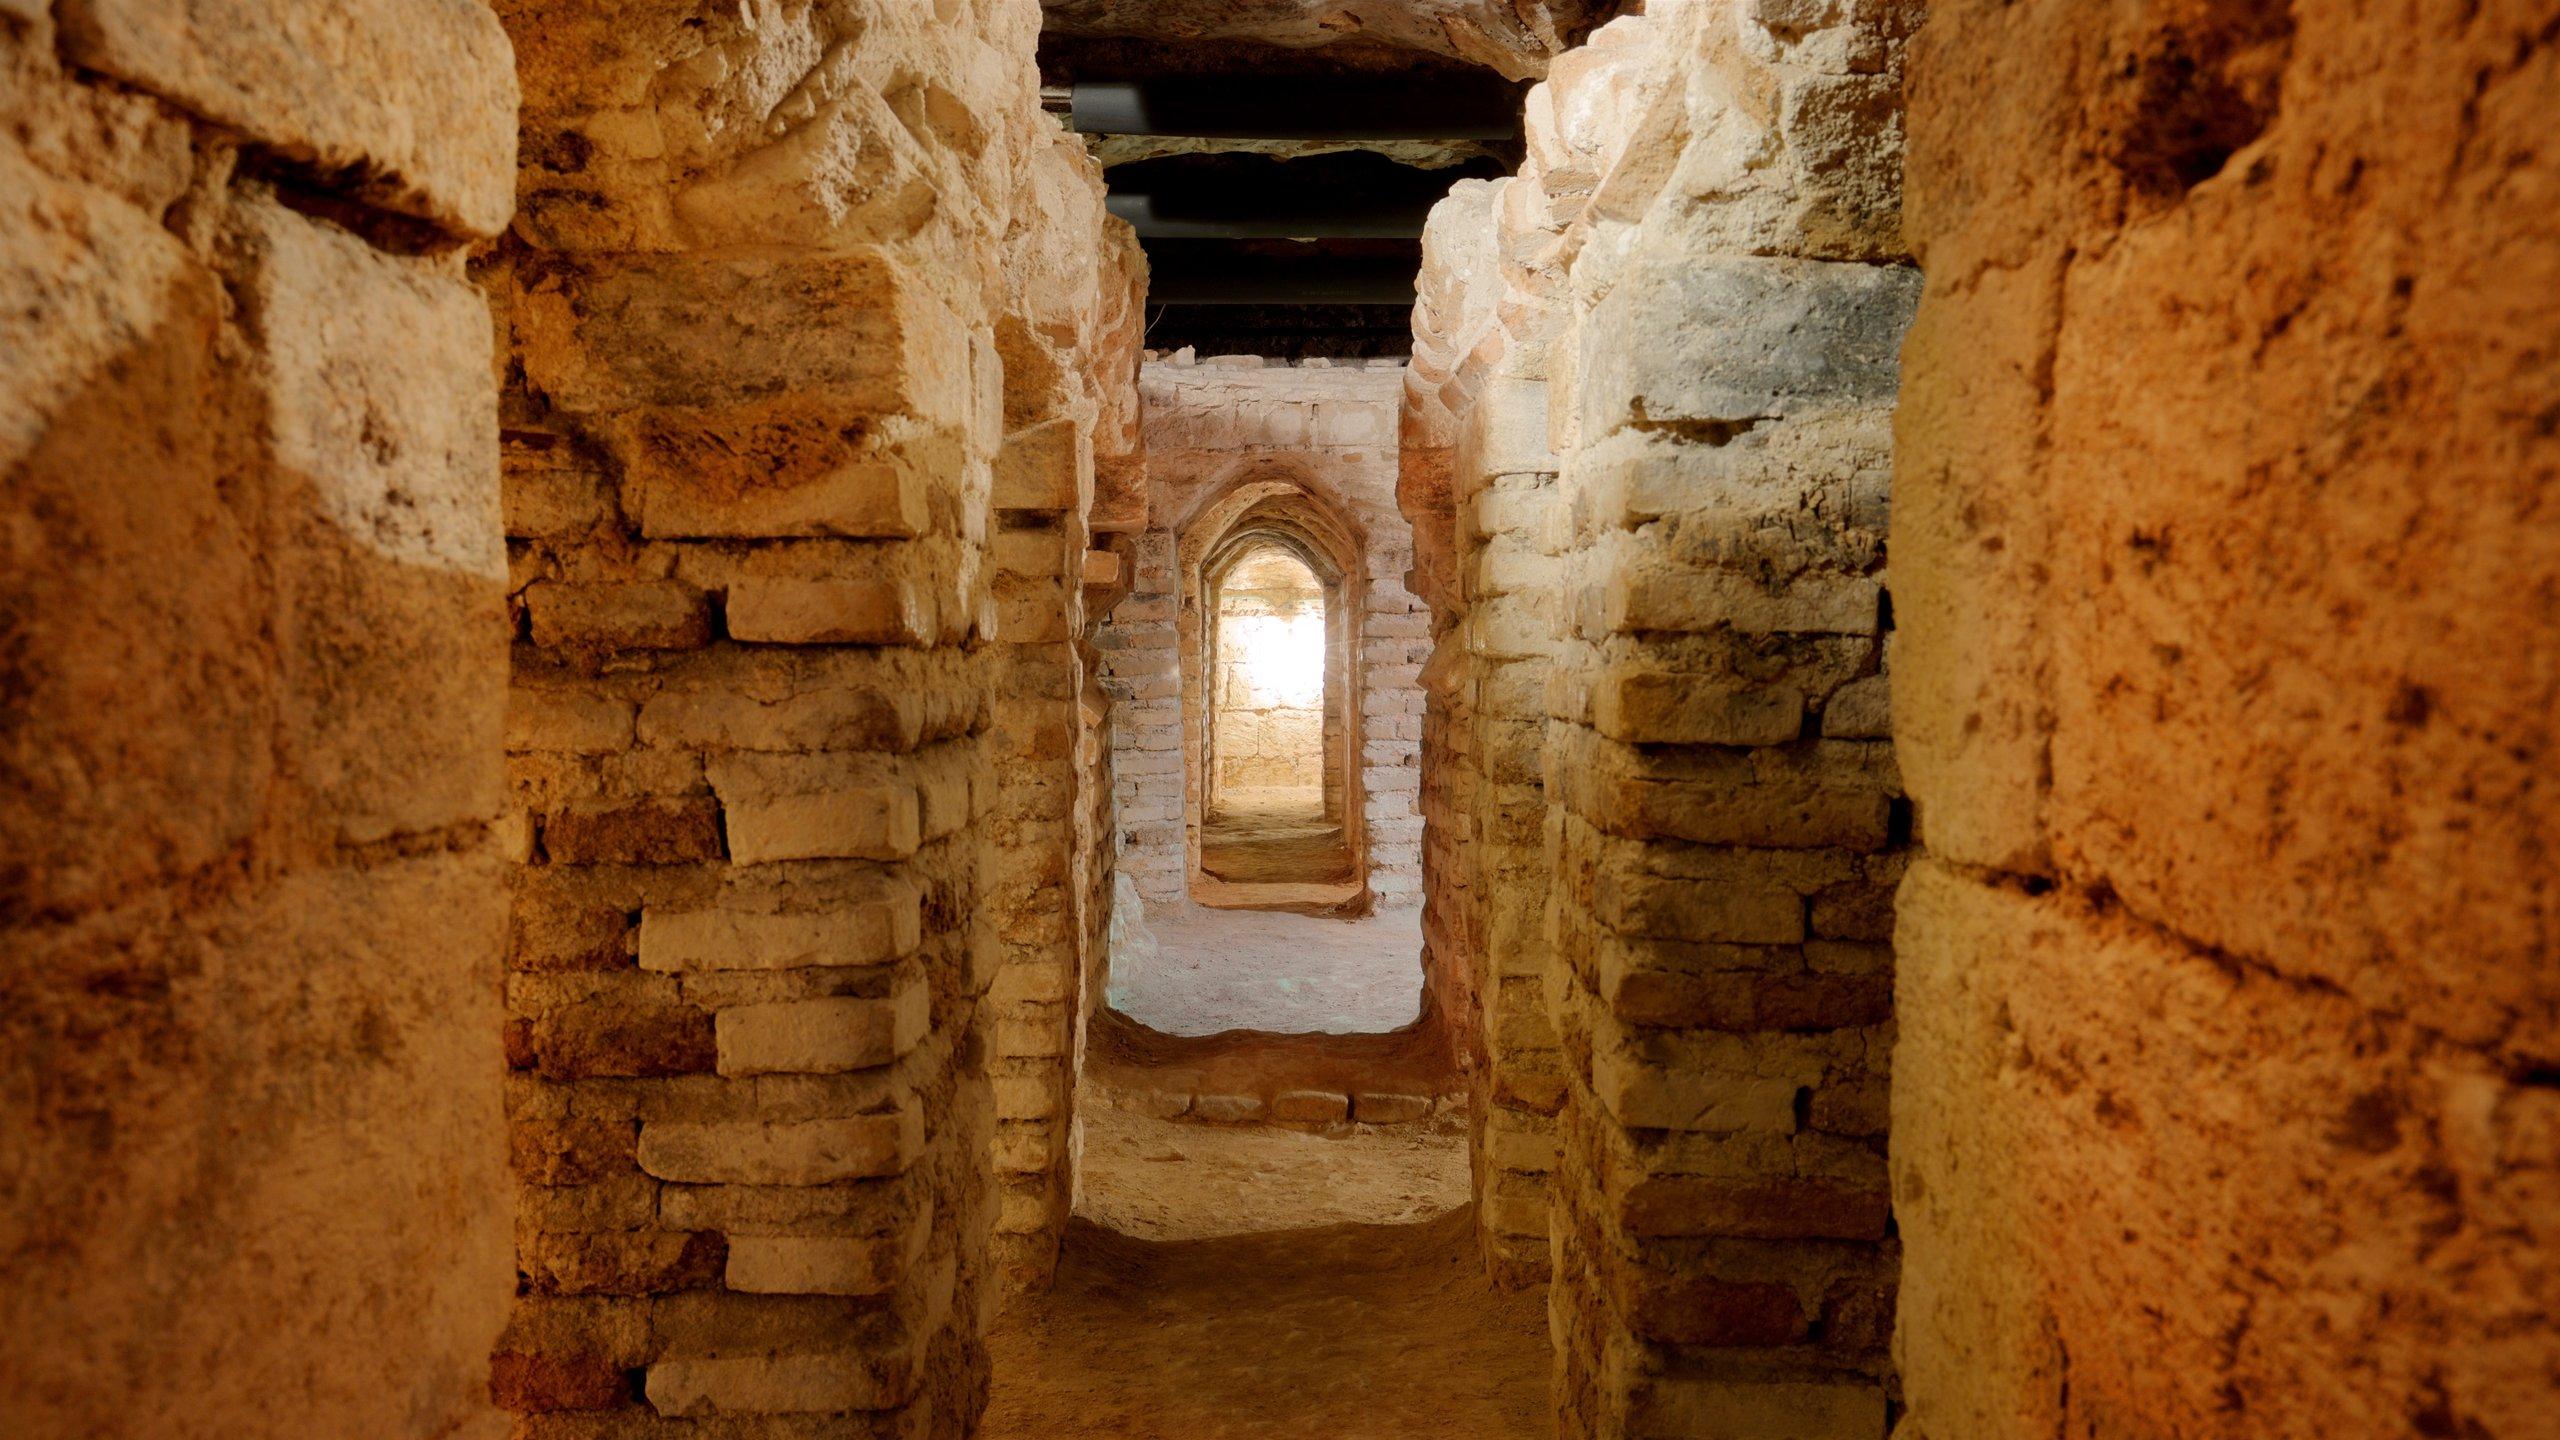 Ancient Bath House of Nazareth, Nazareth, Northern District, Israel